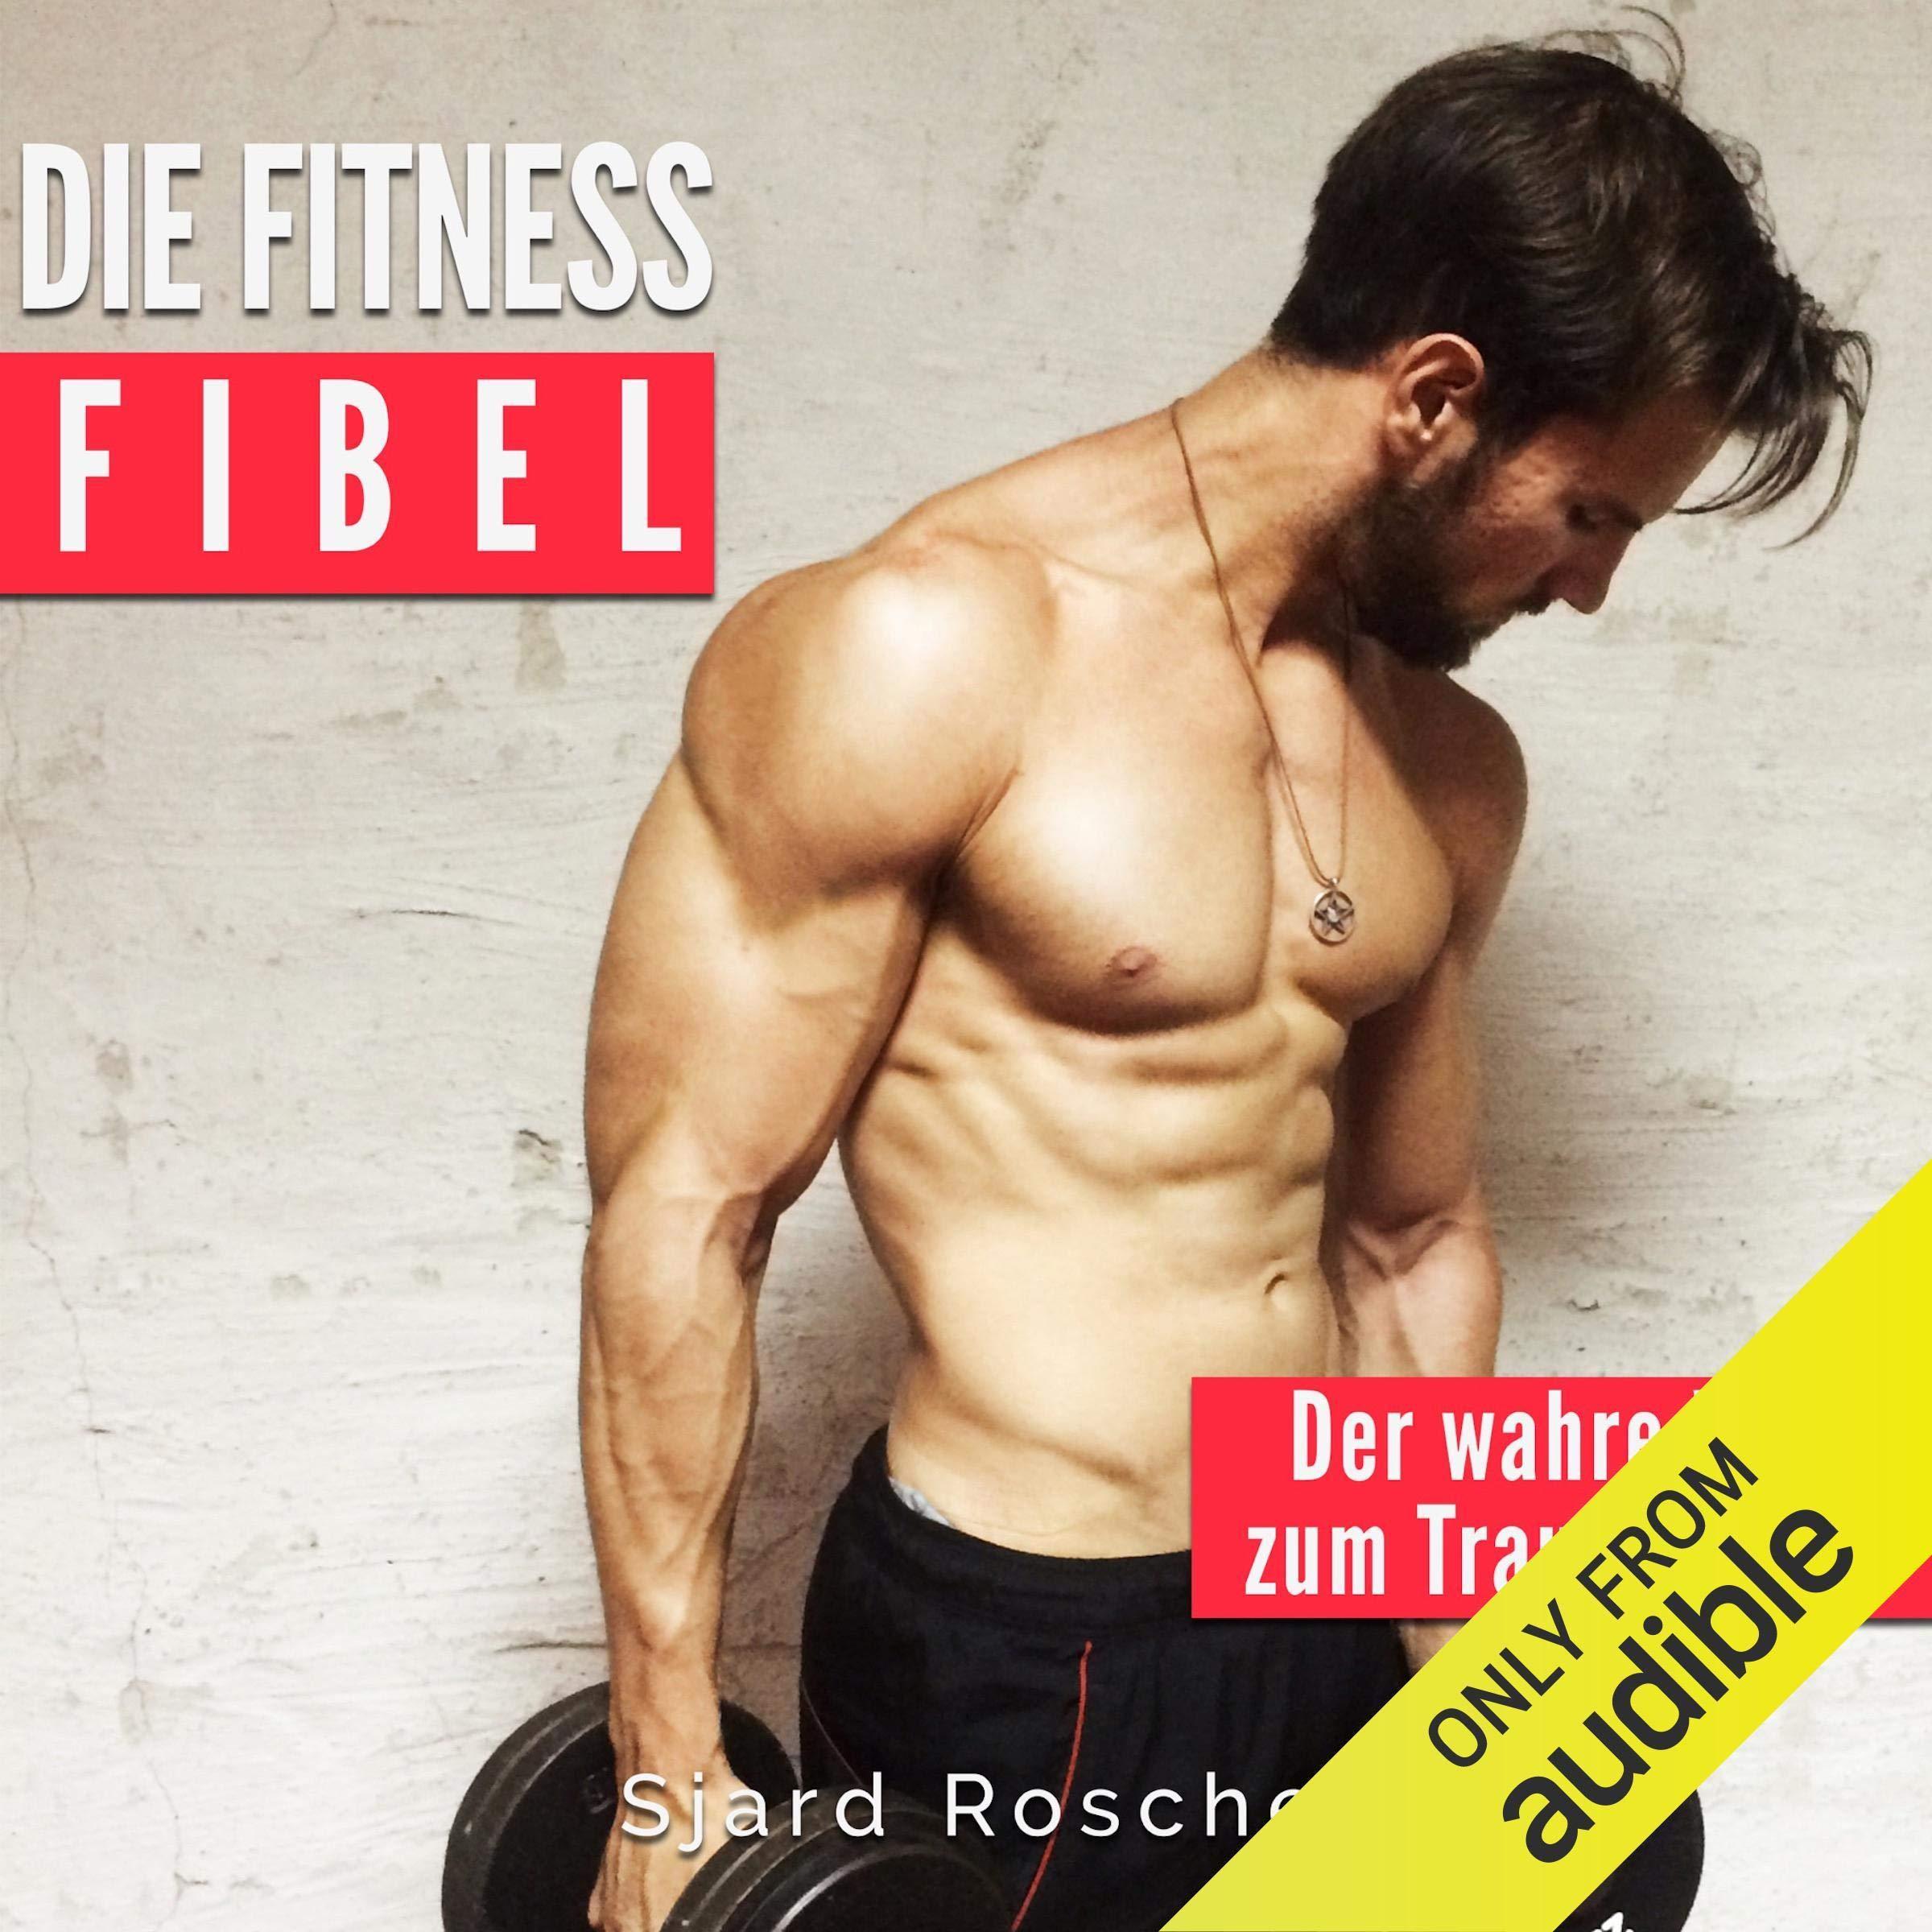 Die Fitness Fibel Der Wahre Weg Zum Muskelaufbau The Fitness Guide The True Way To Build Muscle By Sjard Roscher